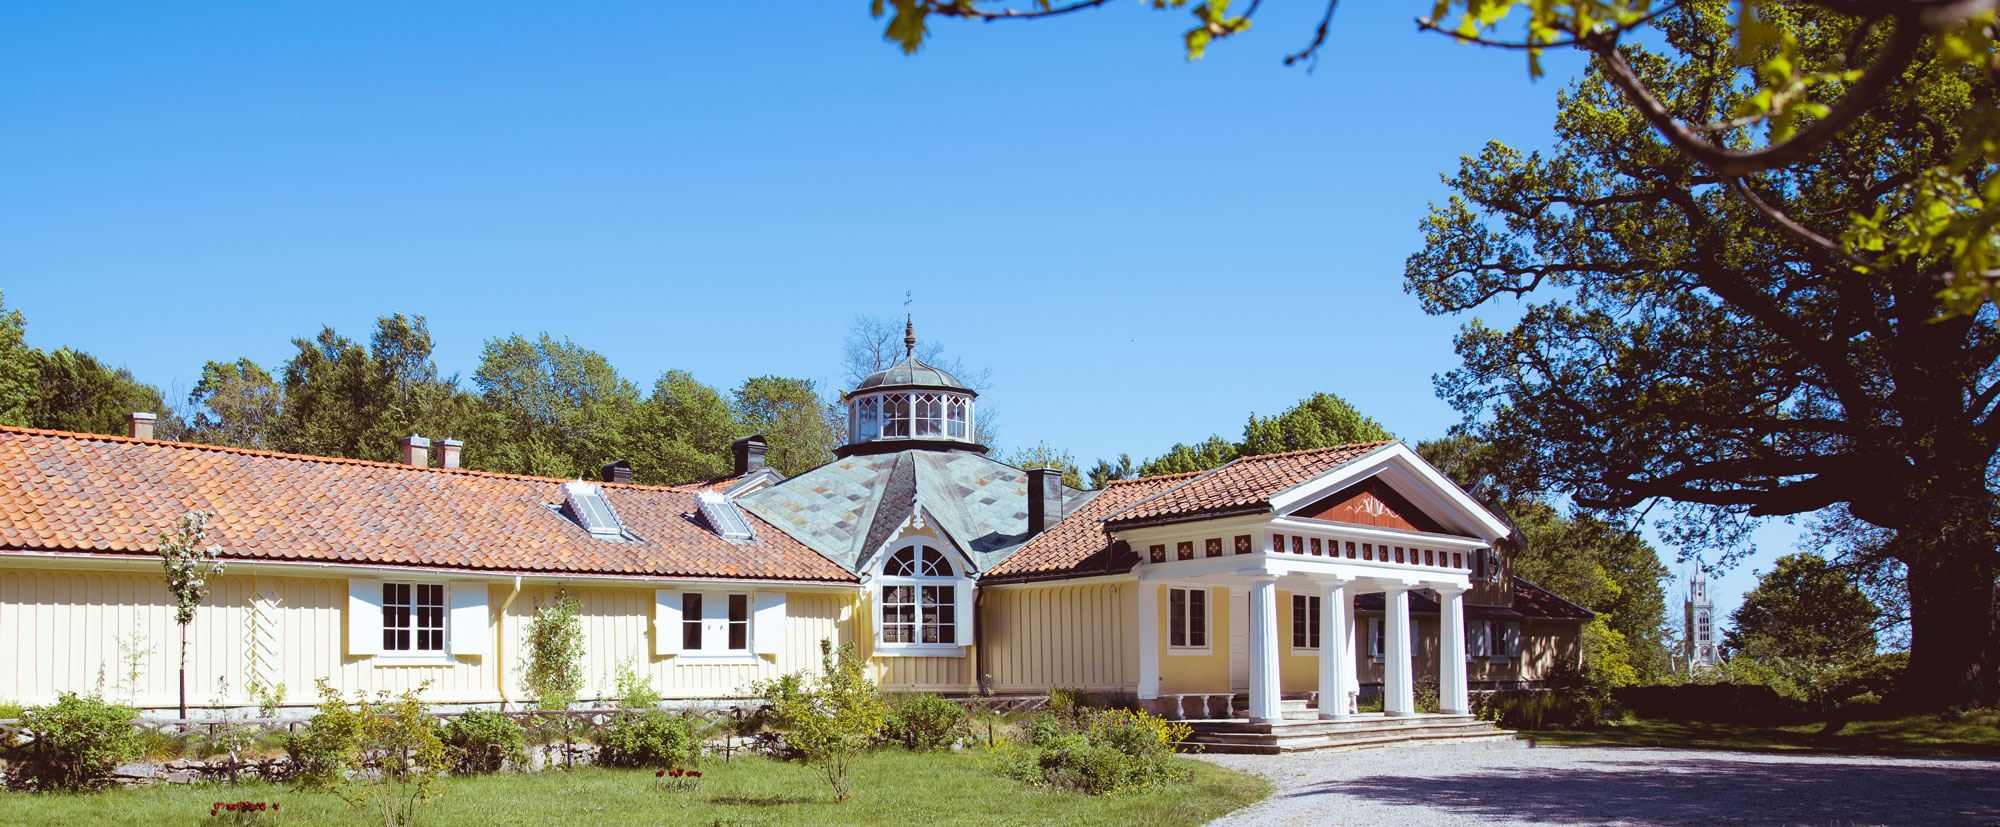 Guided tour - Skärva manor